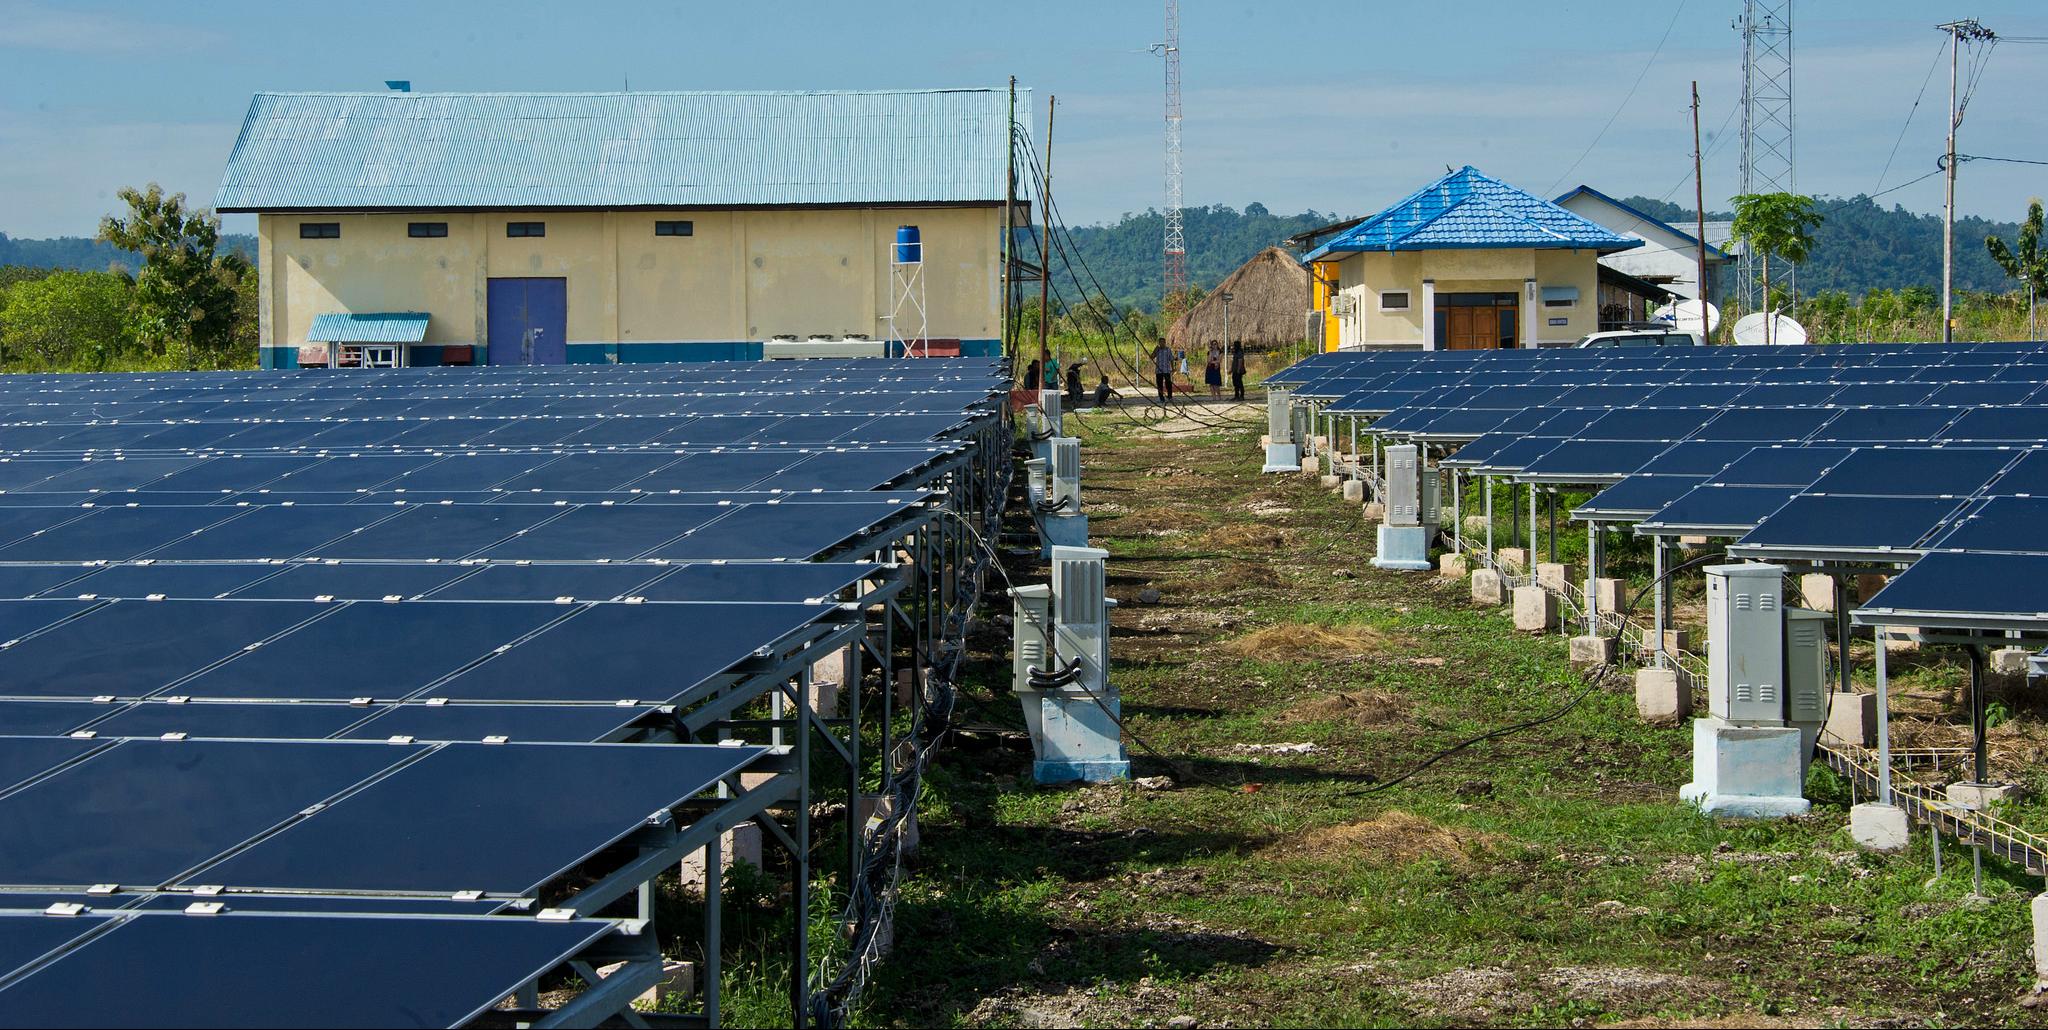 Credits: Asian Development Bank (CC BY-NC-ND 2.0)